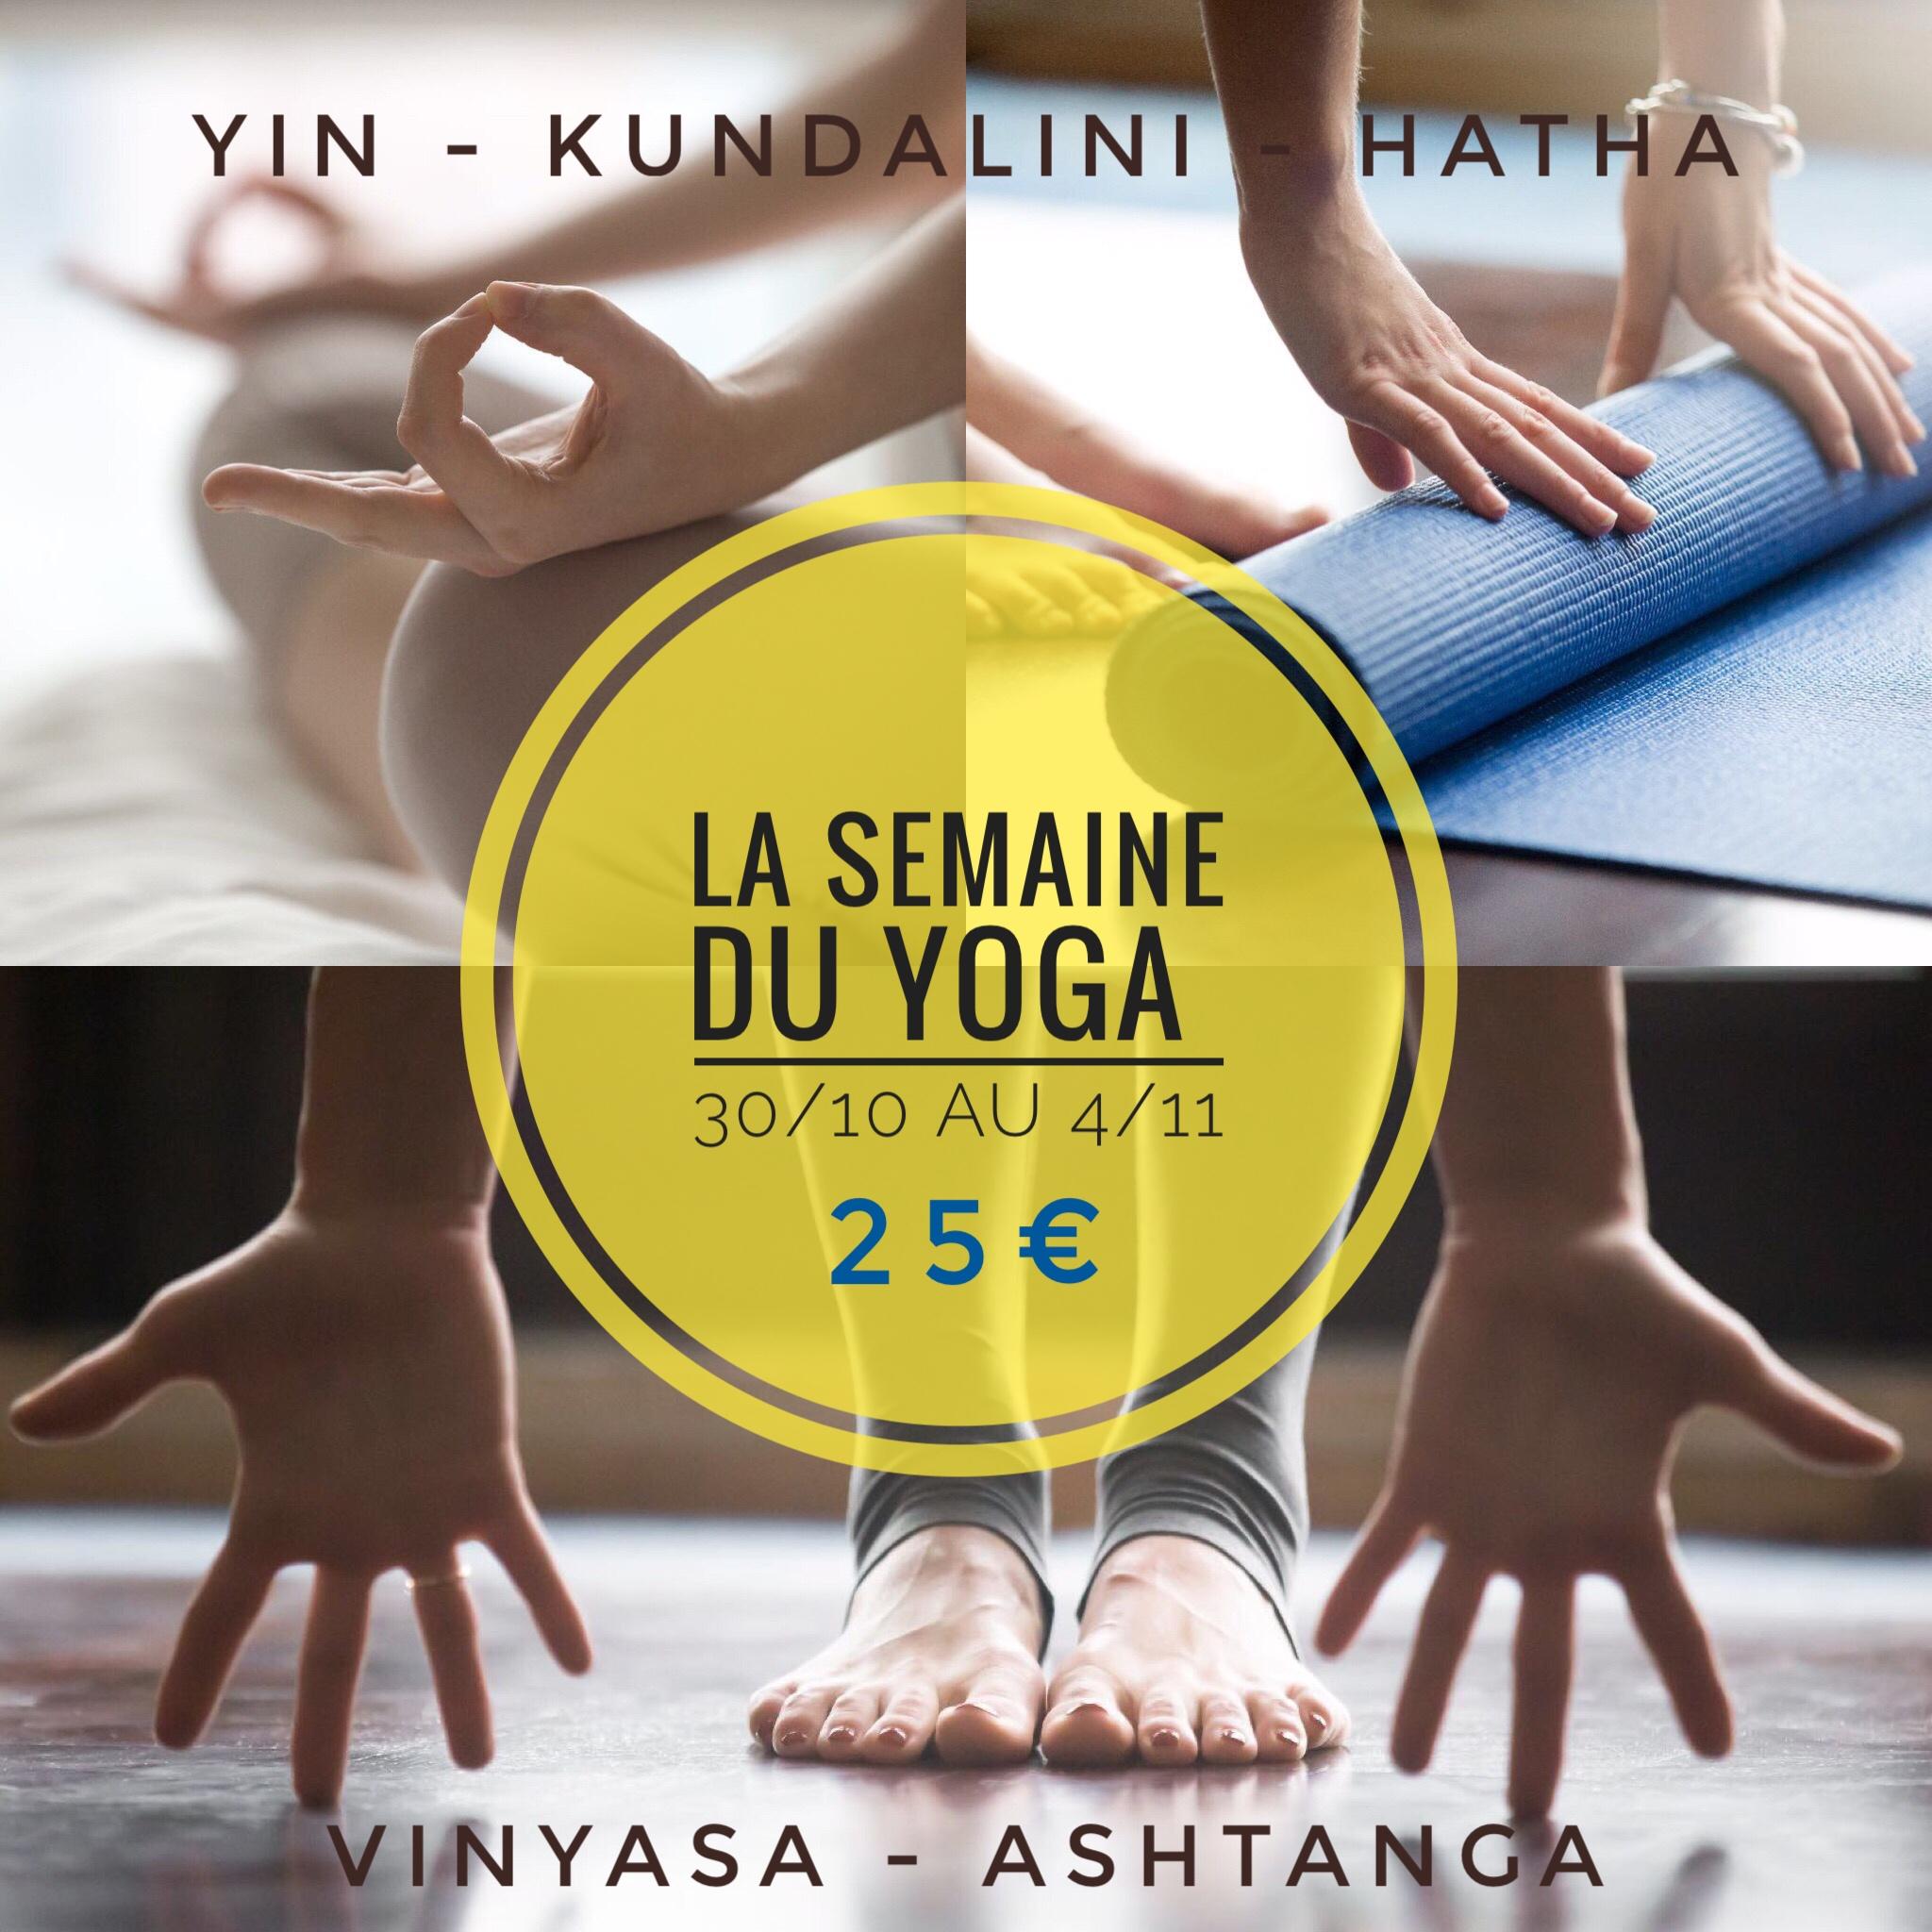 La Semaine du Yoga